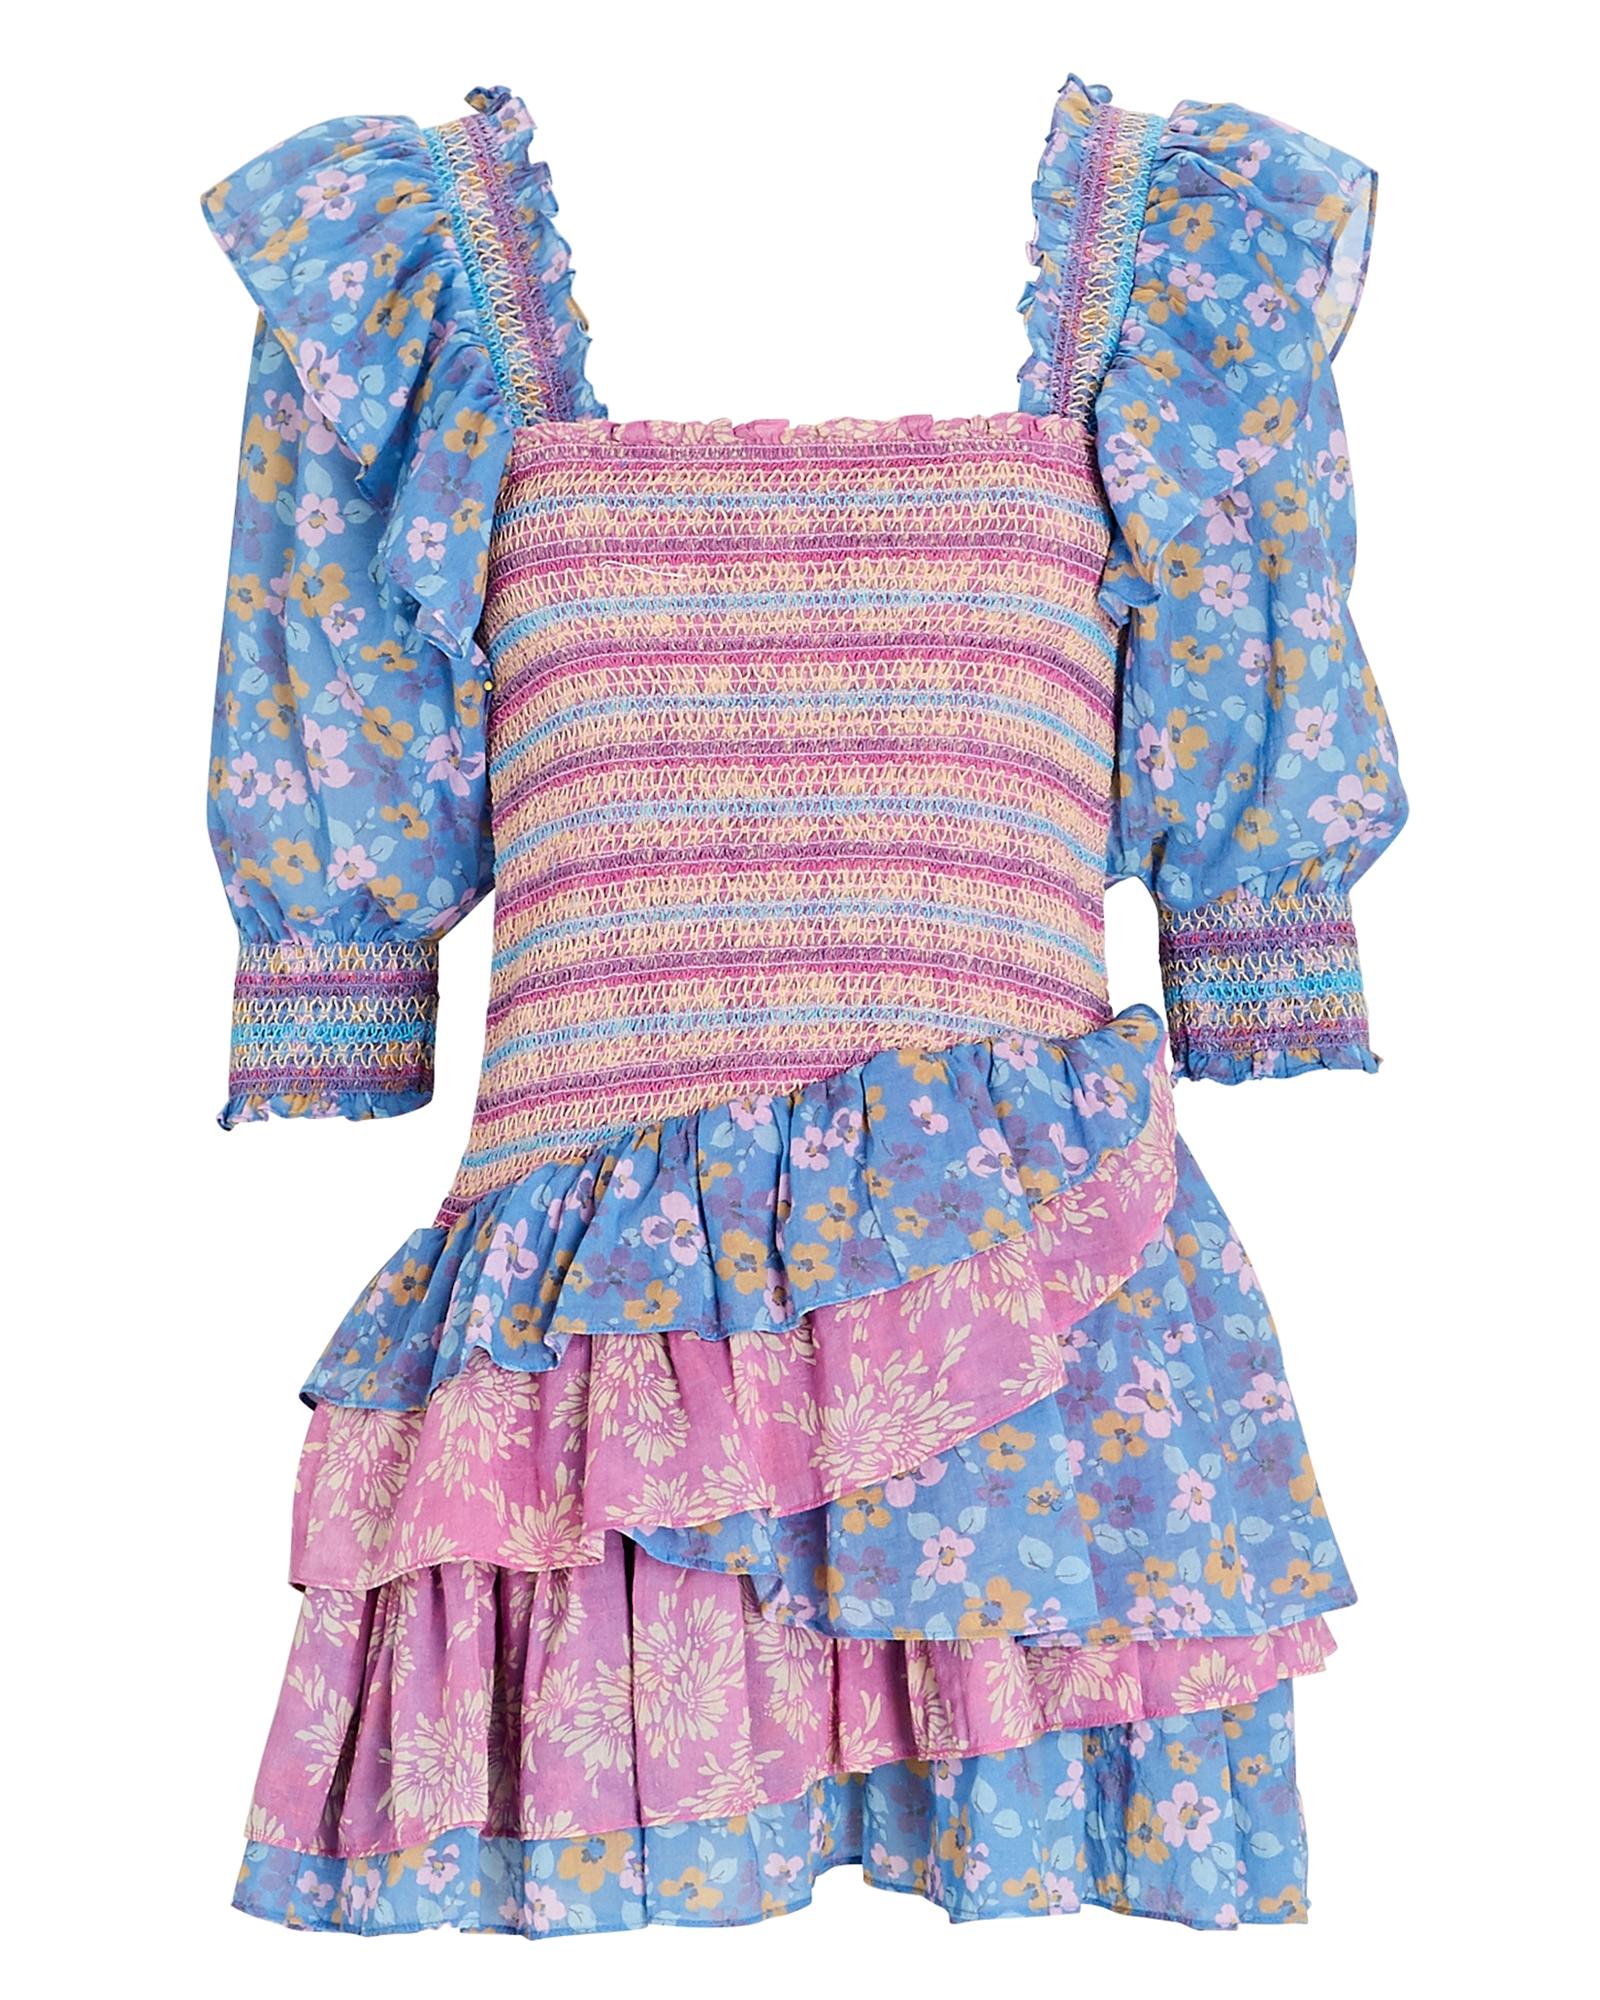 Loveshackfancy Cottons LOVESHACKFANCY GOLDEN COTTON FLORAL MINI DRESS